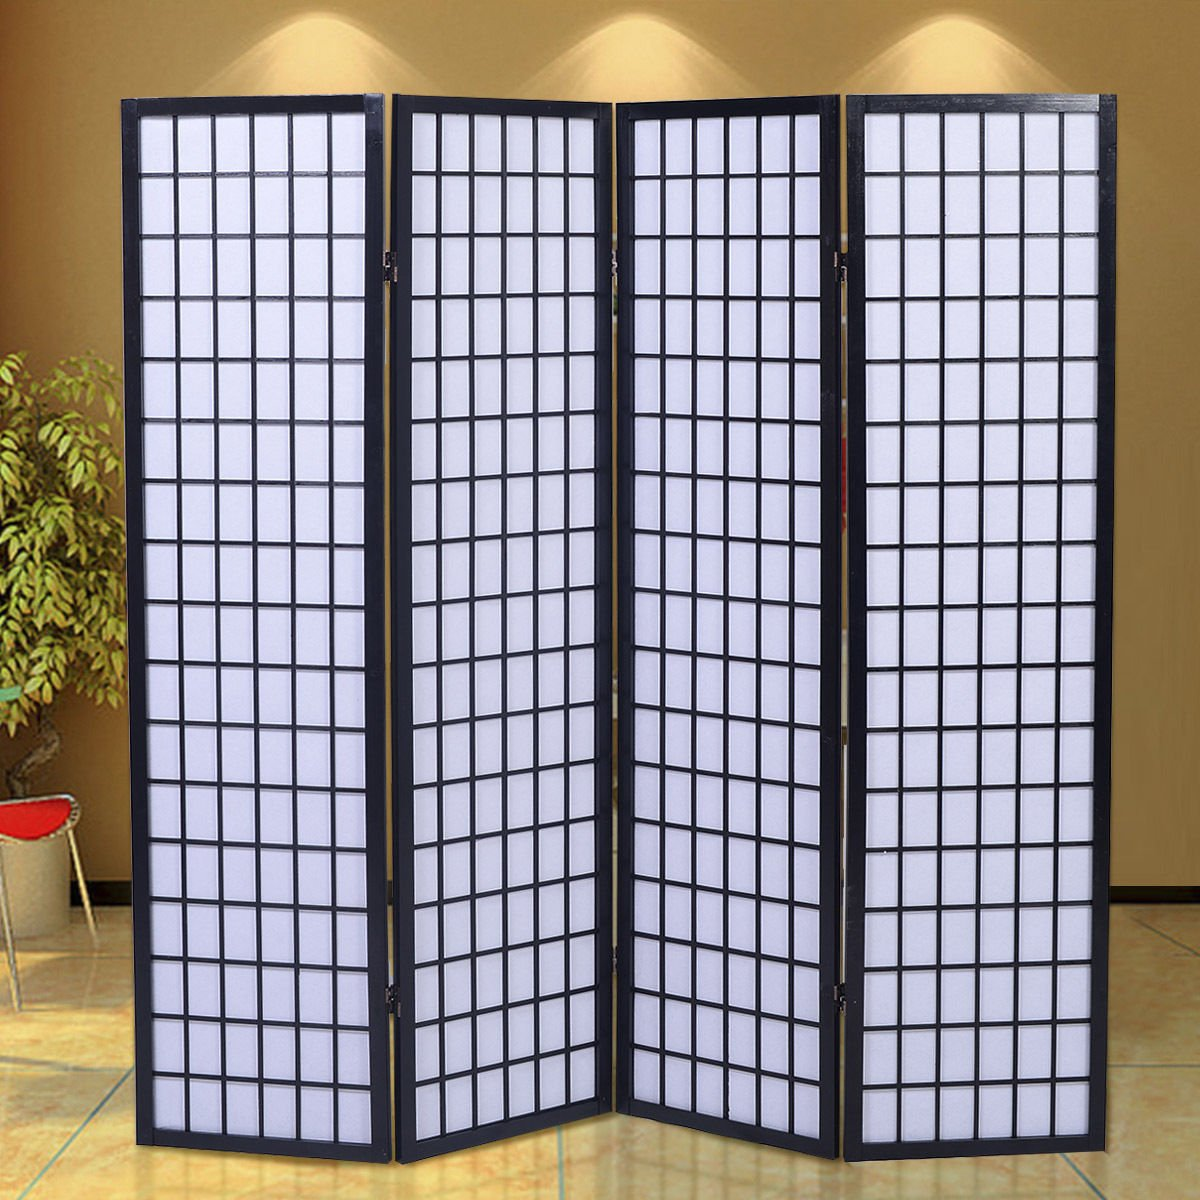 GHP Portable Black Wood Framed Folding 4-Panel Room Divider Screen